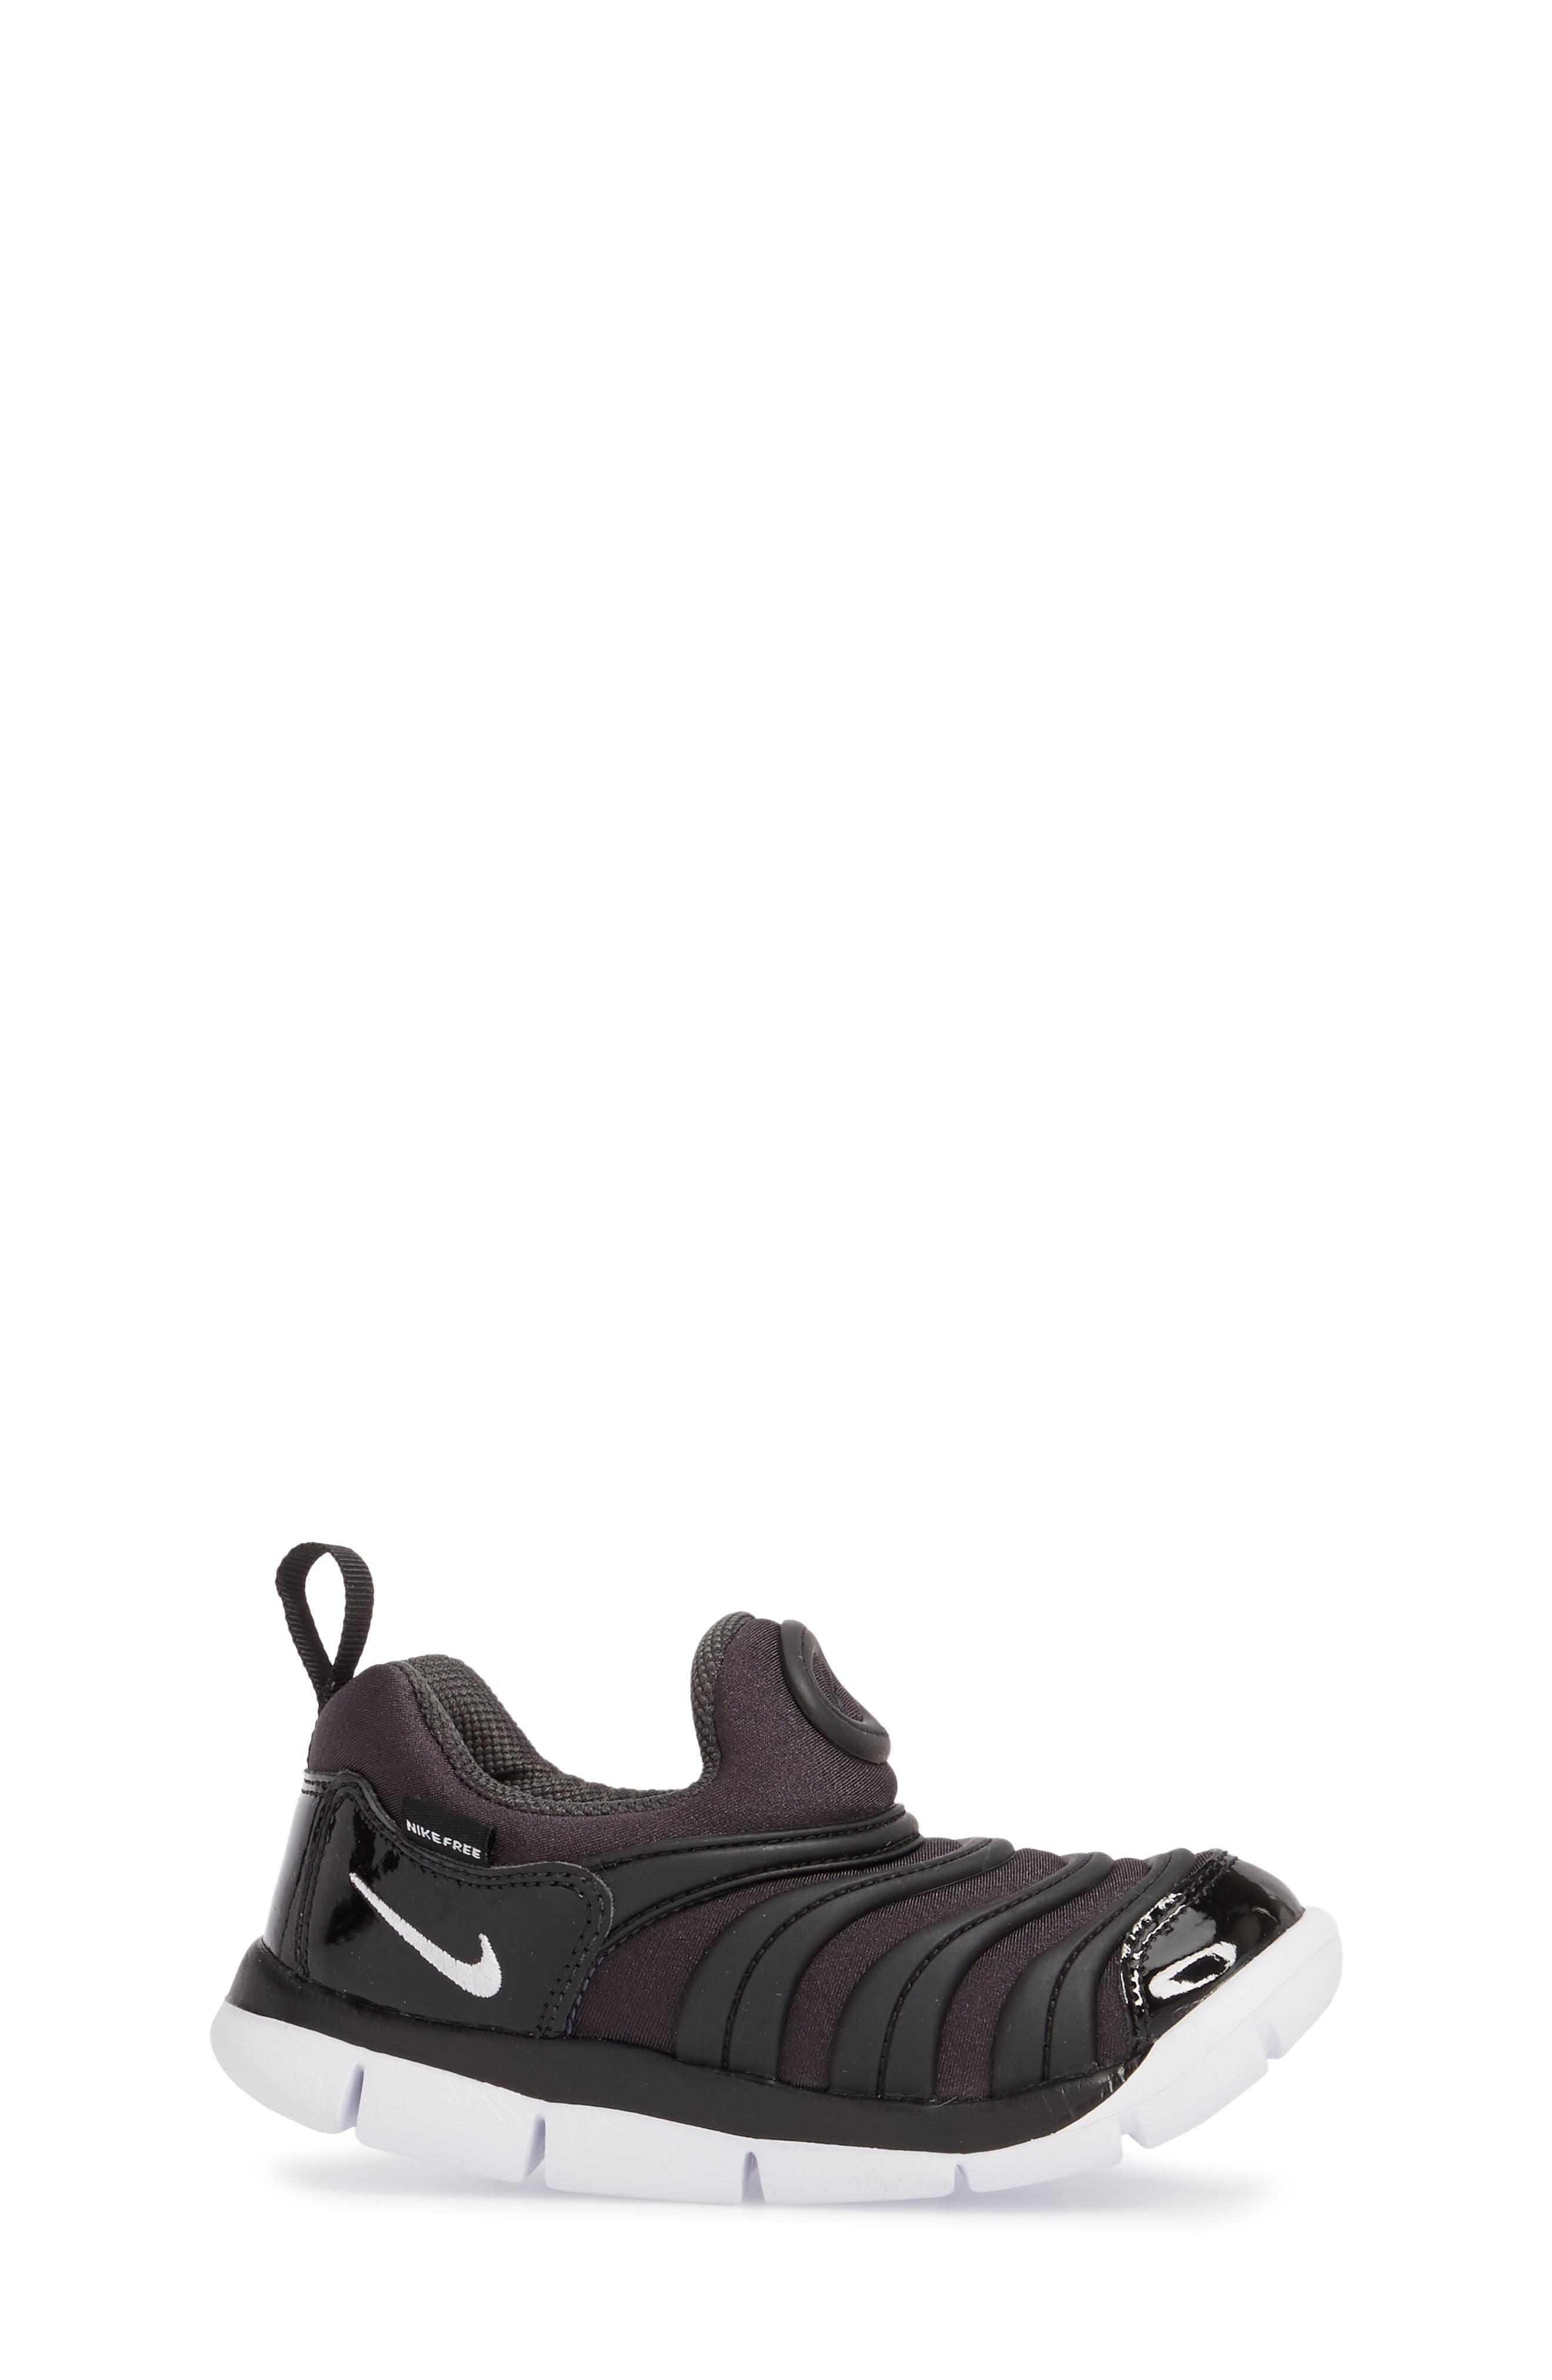 Dynamo Free Sneaker,                             Alternate thumbnail 3, color,                             ANTHRACITE/ WHITE/ BLACK